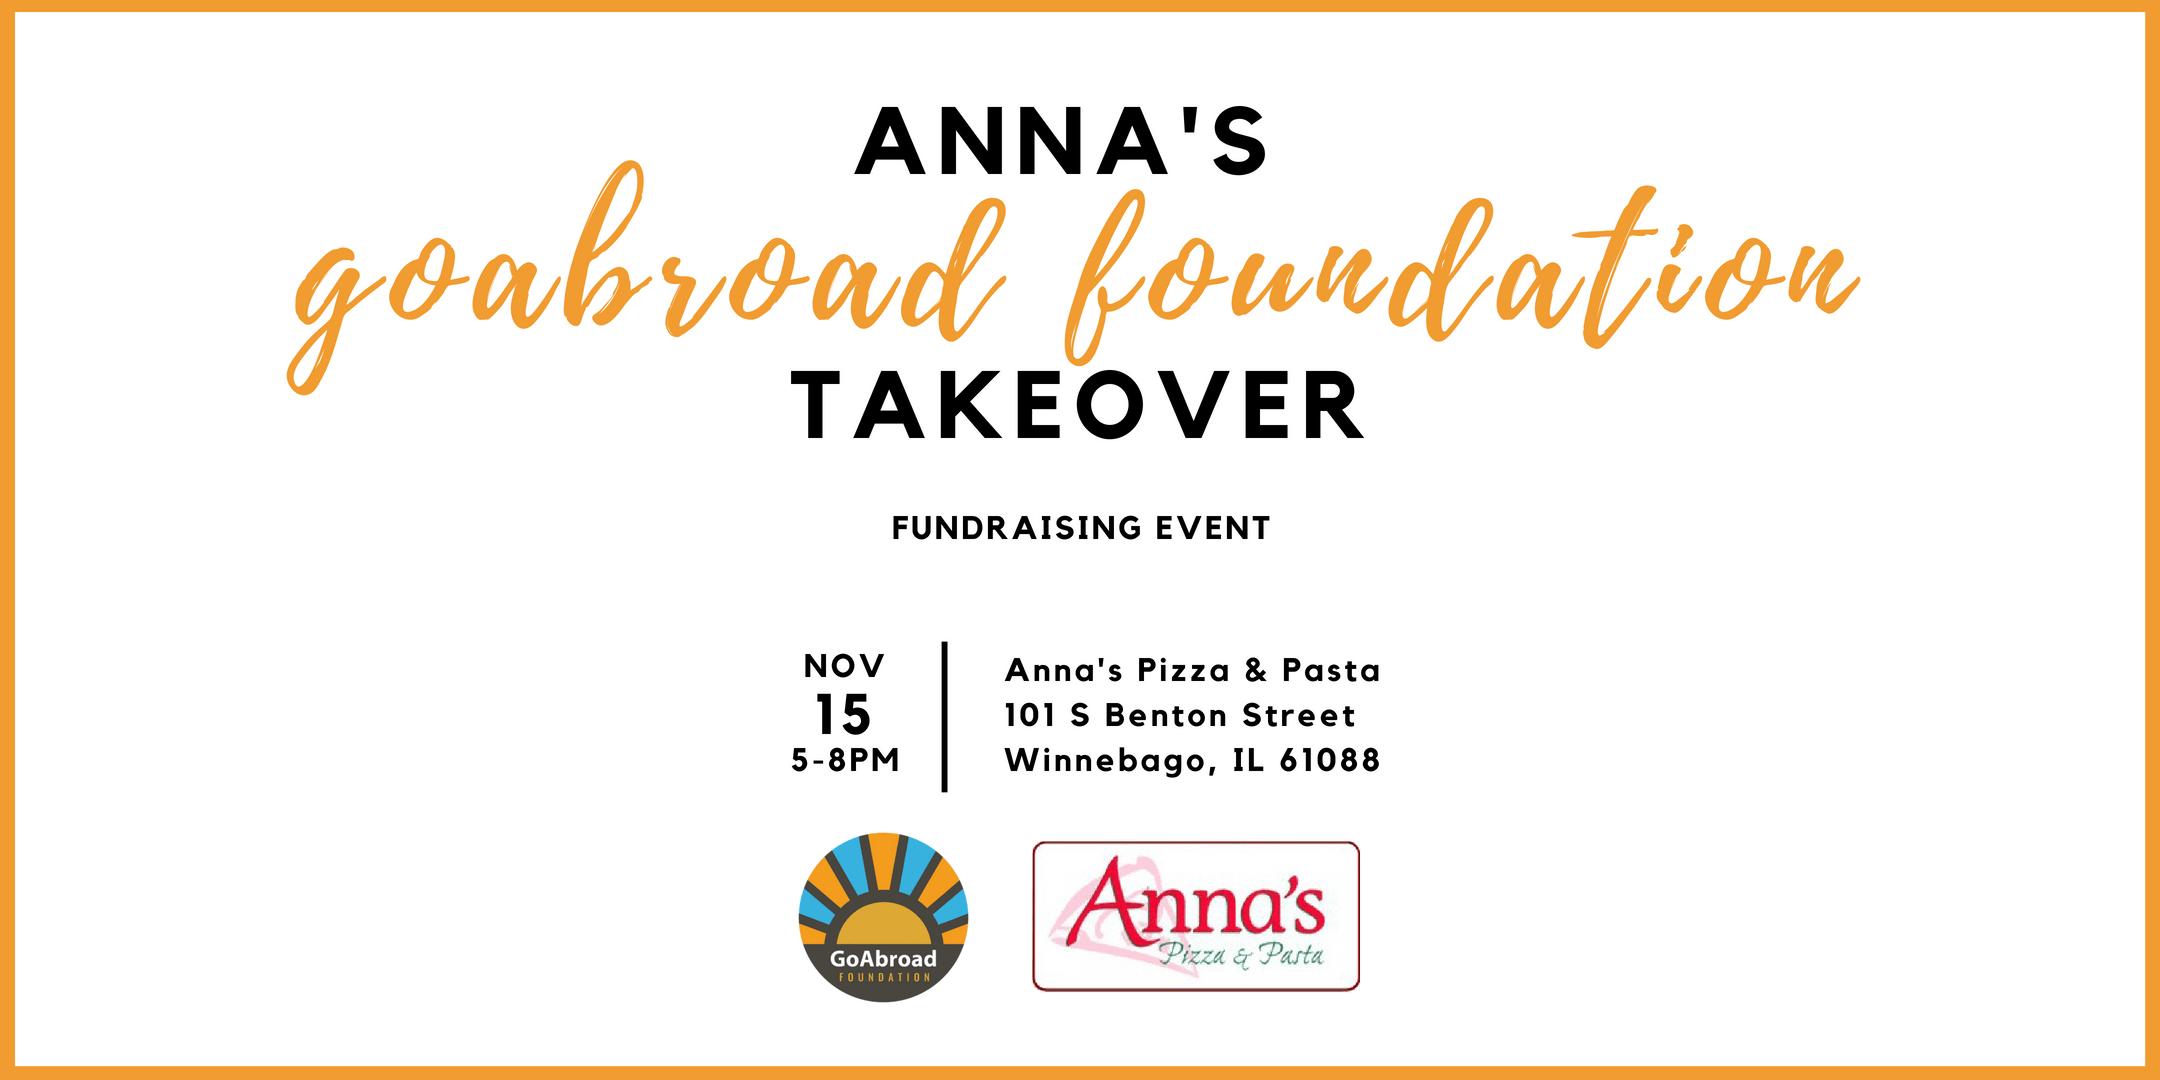 anna's fundraising event